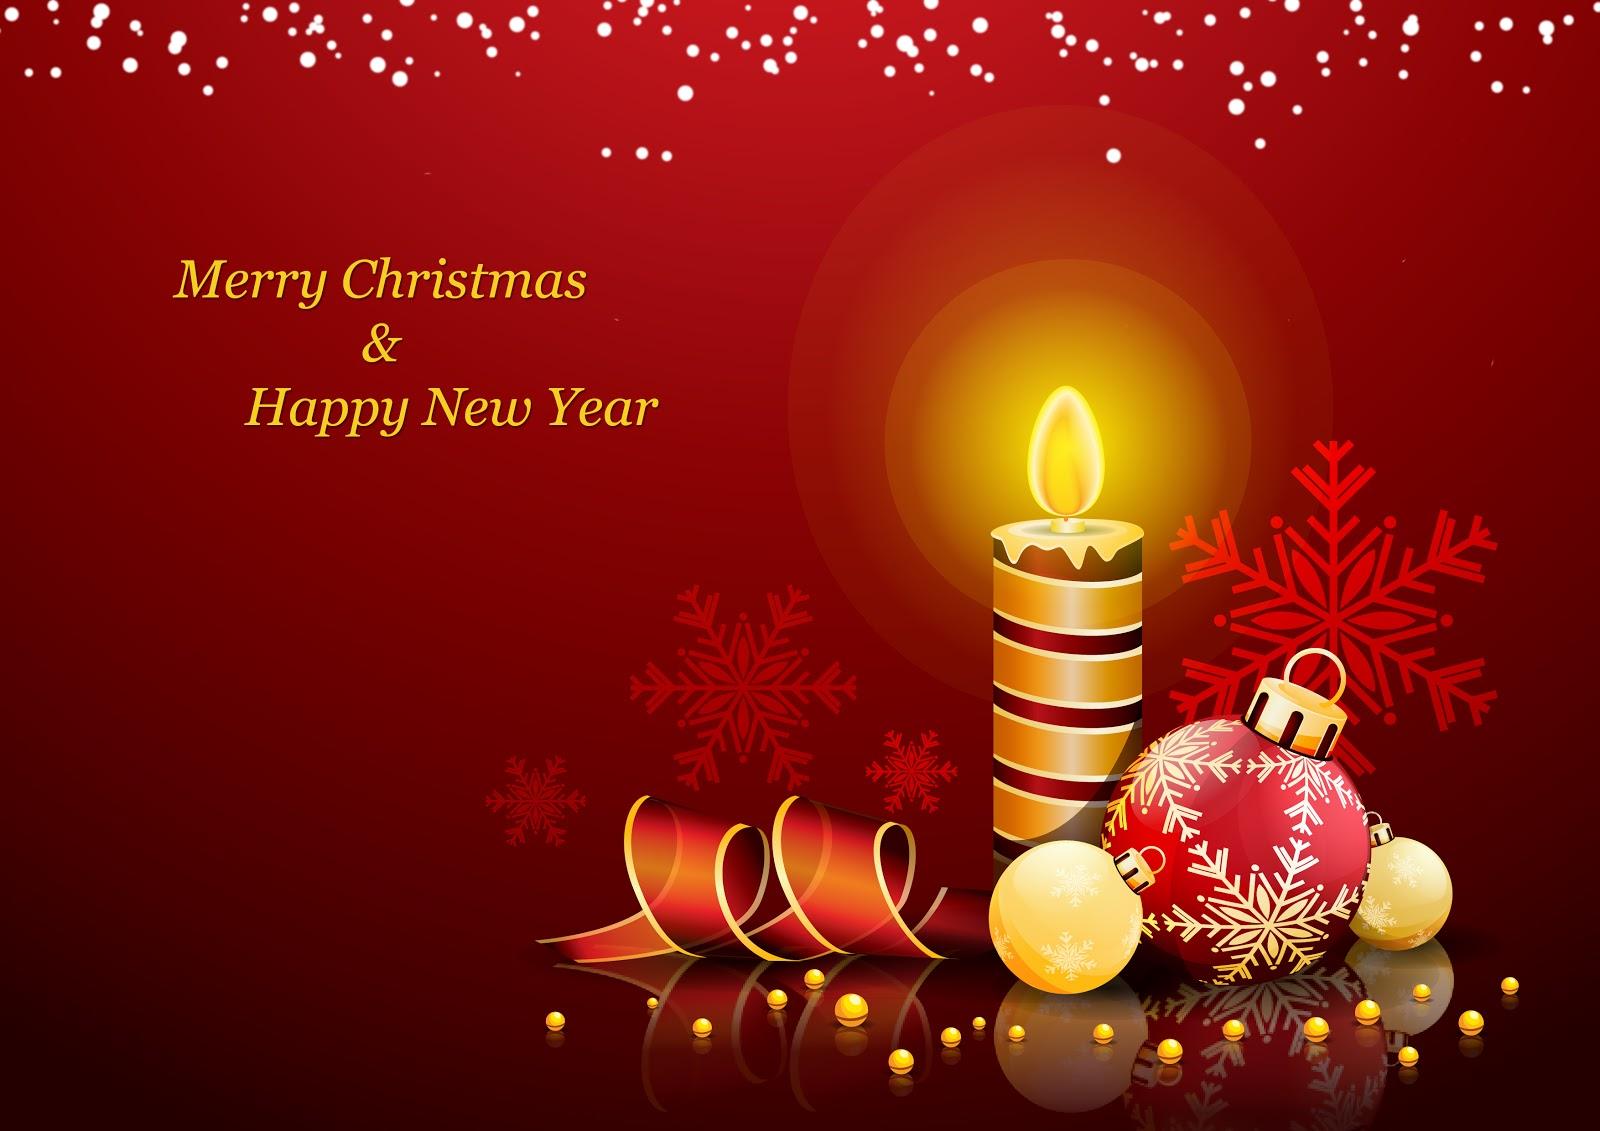 http://4.bp.blogspot.com/-v7FczzsTlOI/UNiH4BzQZnI/AAAAAAAAJUY/Cd9GjvqRQf0/s1600/Merry+Cristmas+greeting+(21).jpg